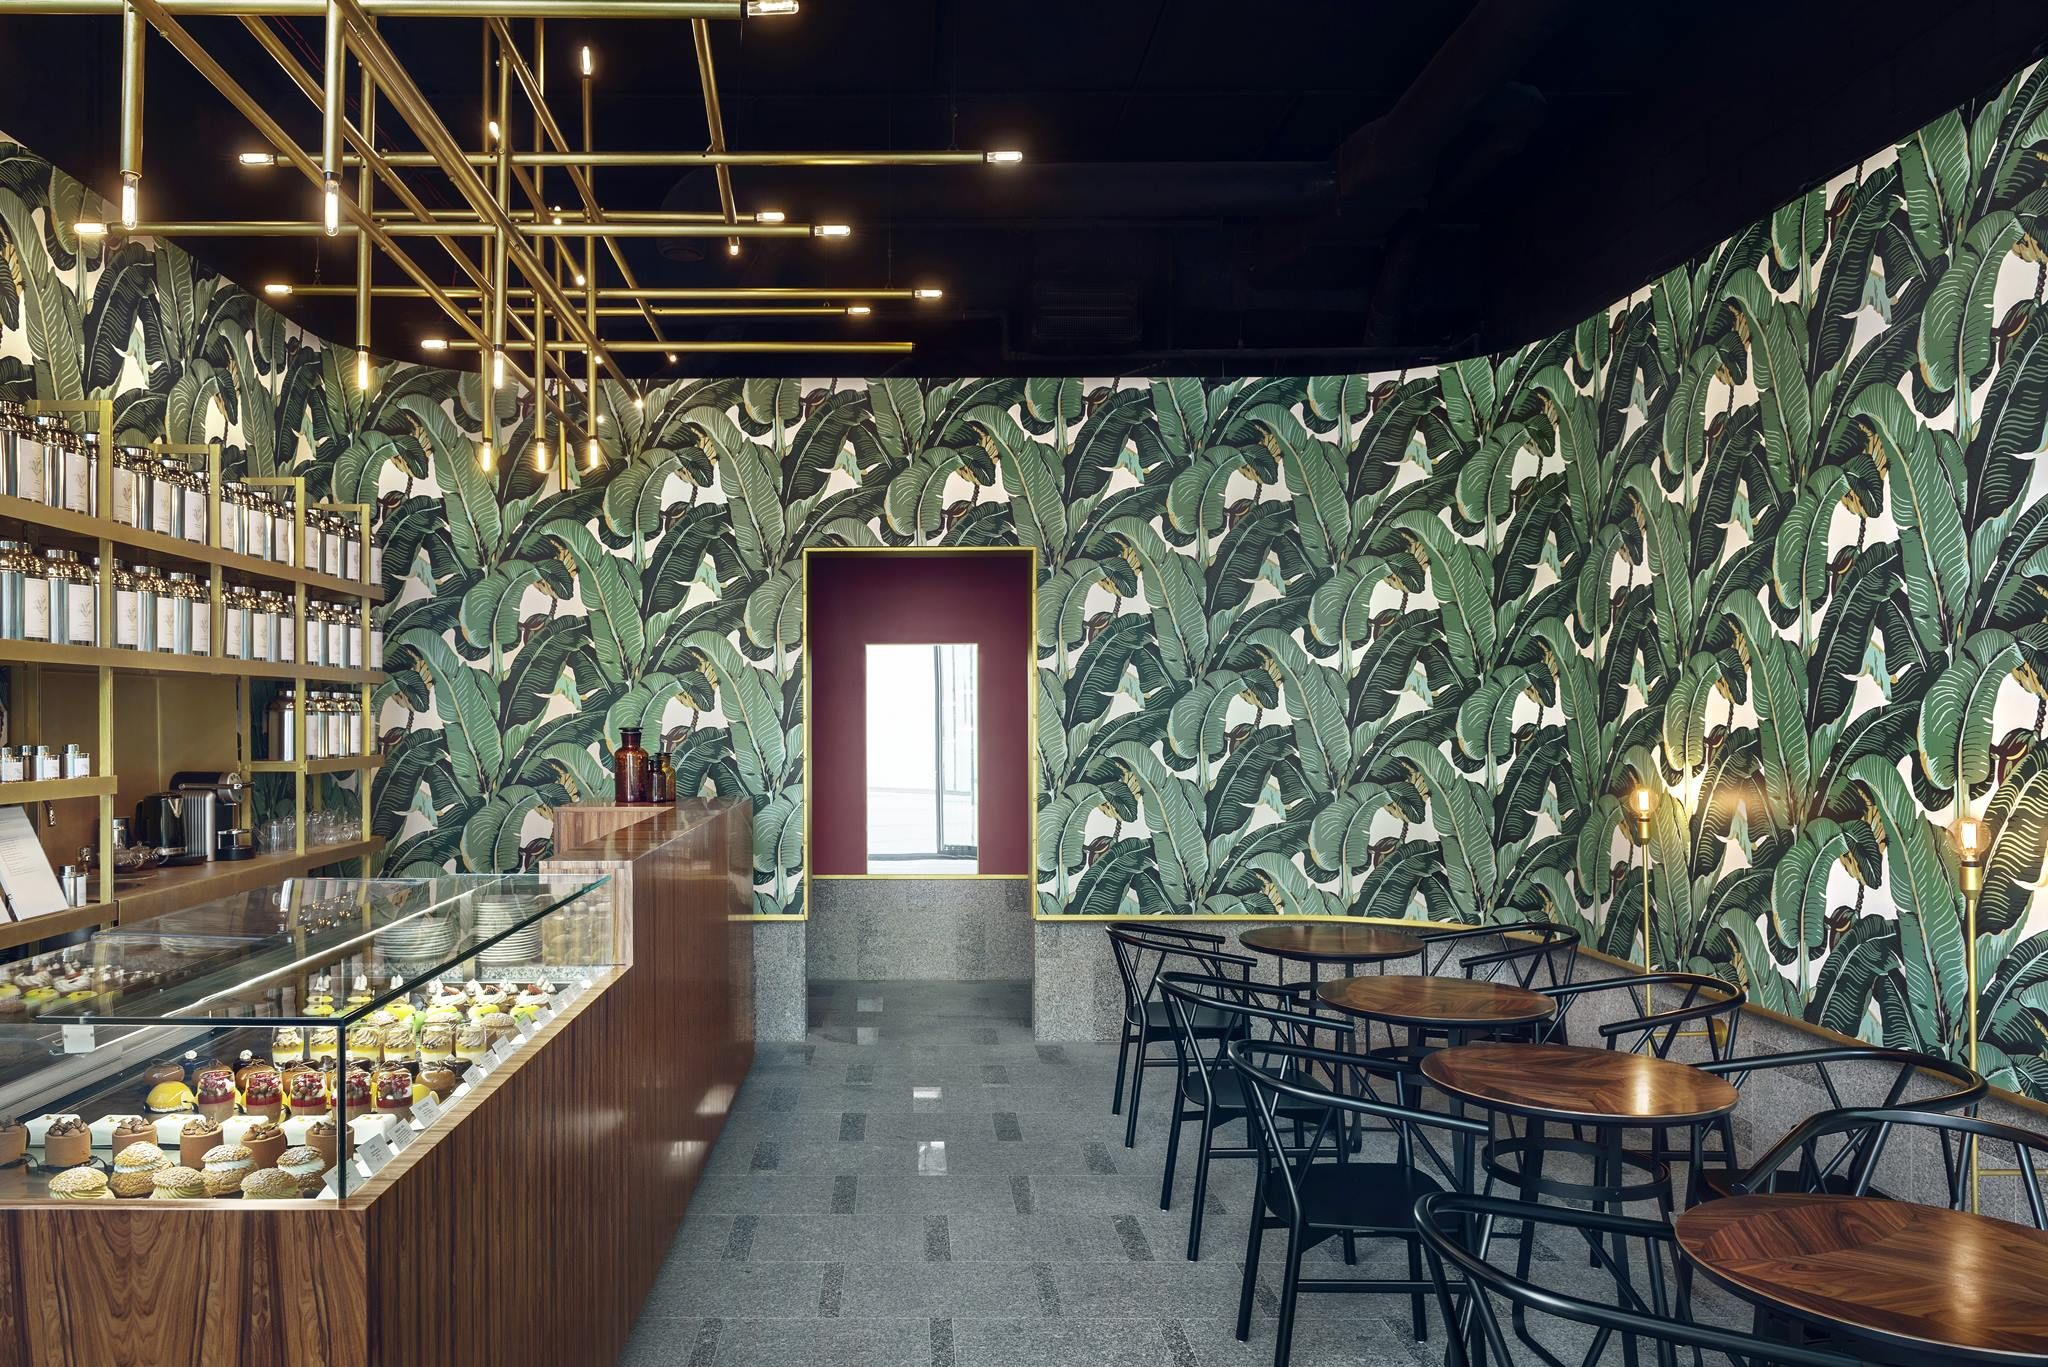 odette tea room w warszawie projektu ugo architecture - pln design